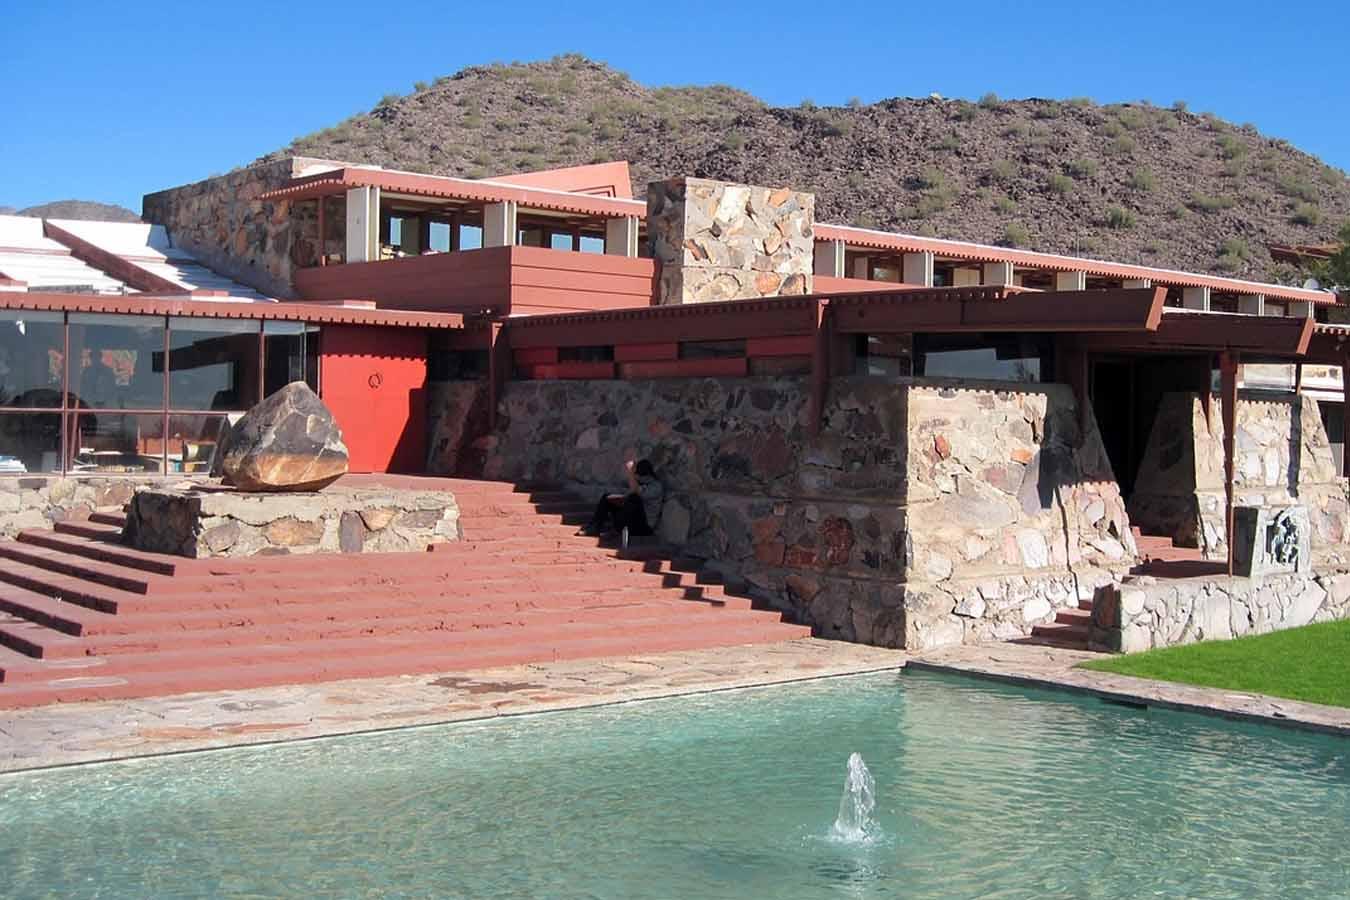 Frank Lloyd Wright, Taliesin West, Scottsdale Arizona